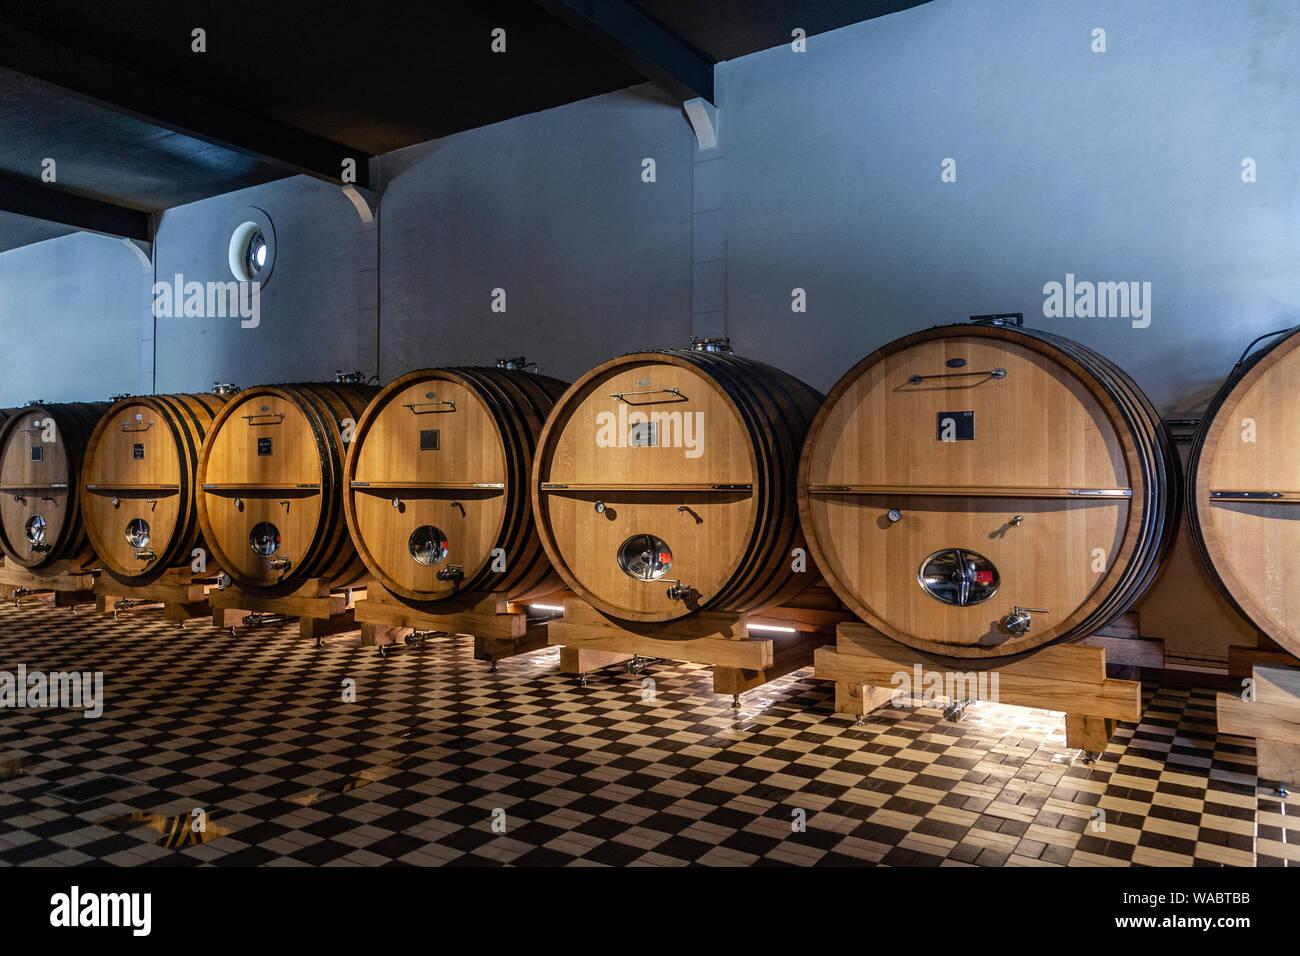 France Lyon 2019-06-21 rows giant wooden barrels, aging